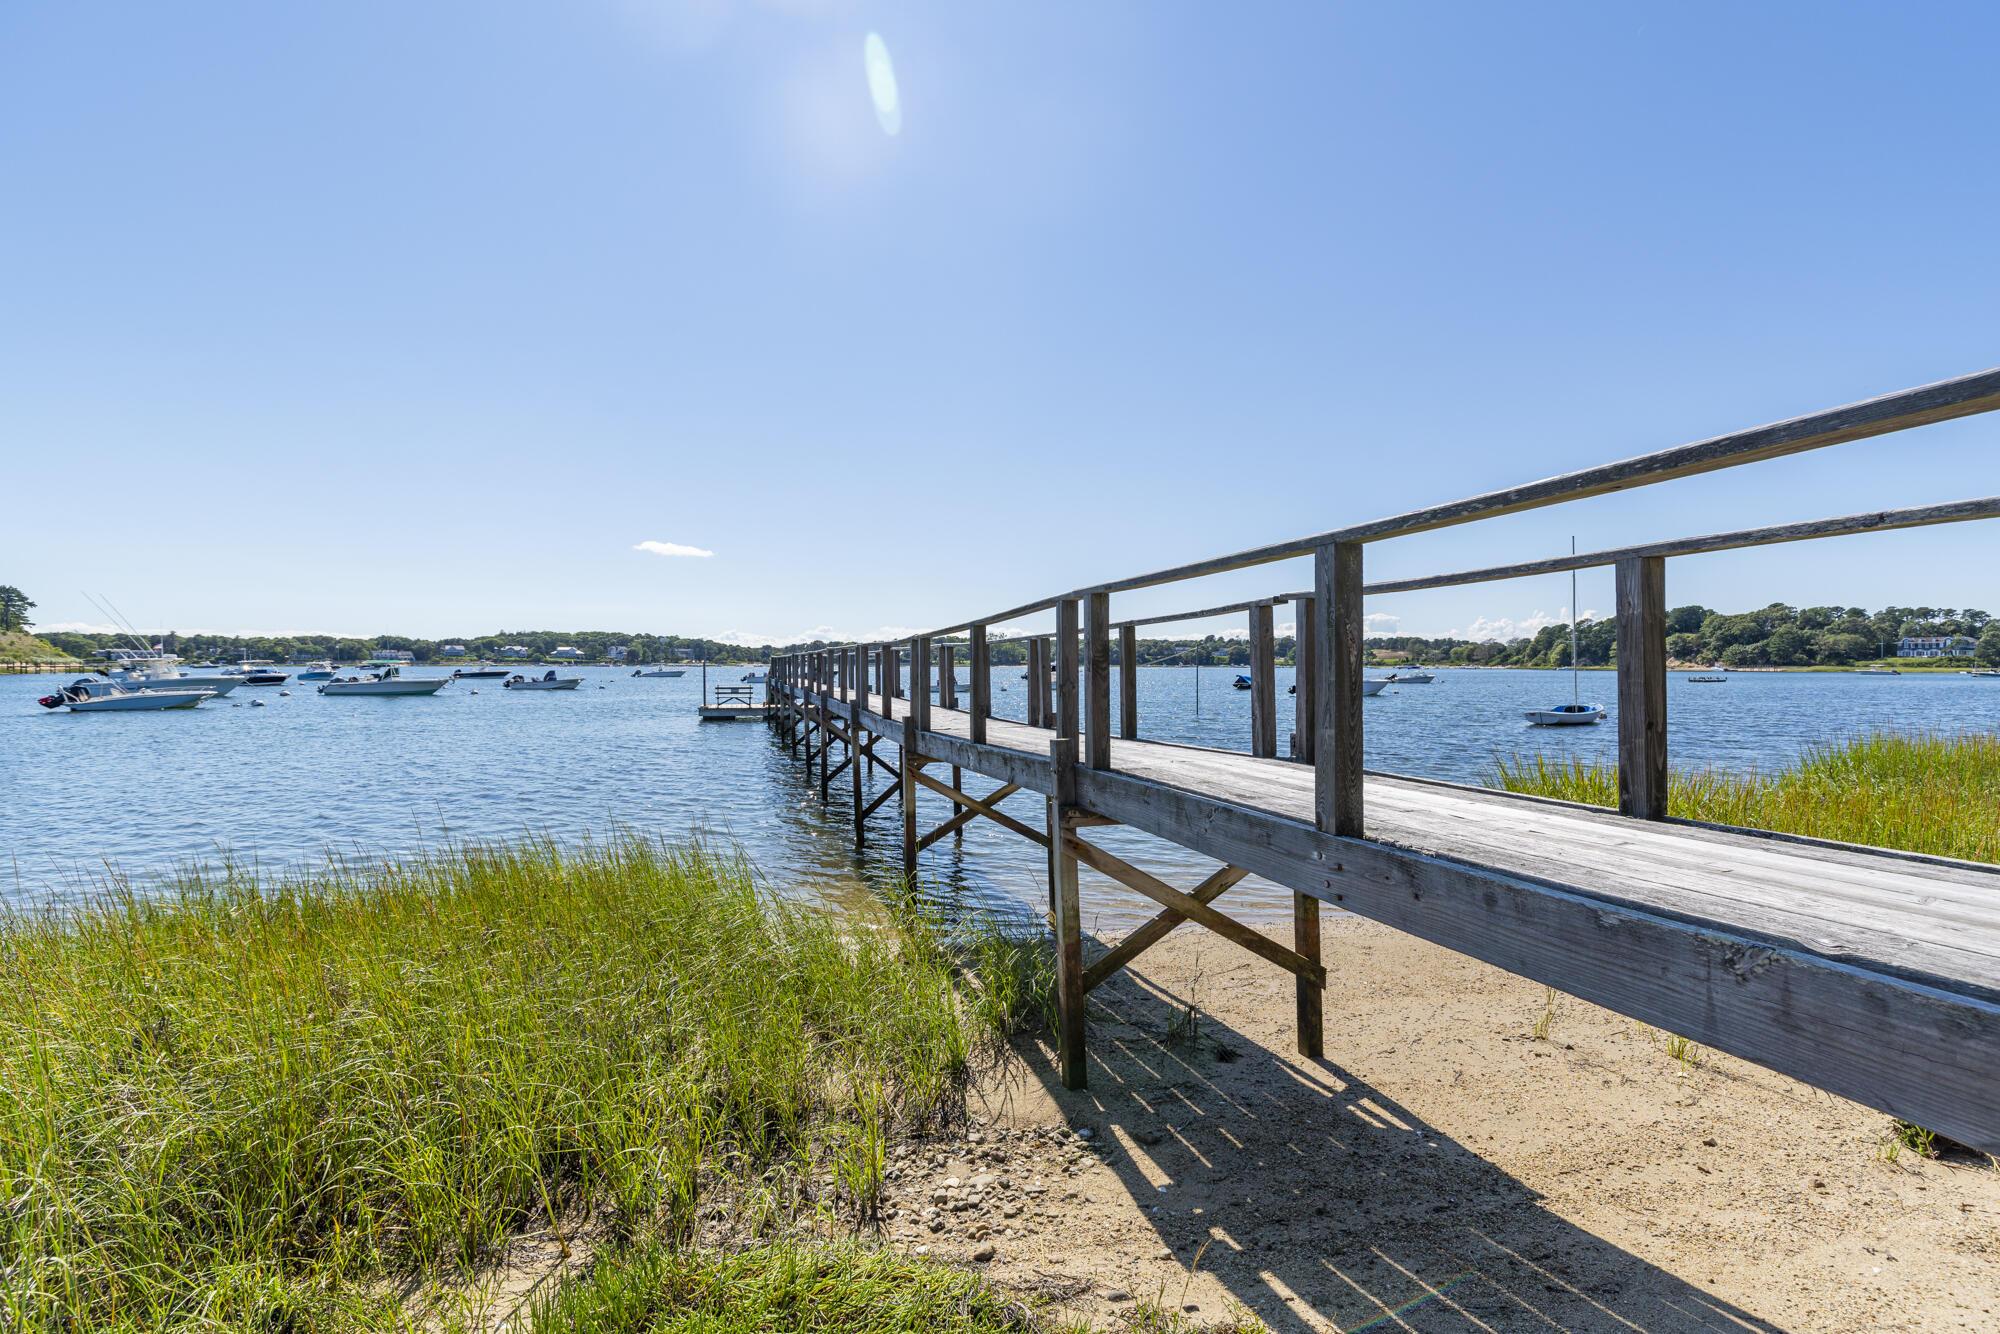 69 Strong Island Road, Chatham, MA  02633 - slide 42